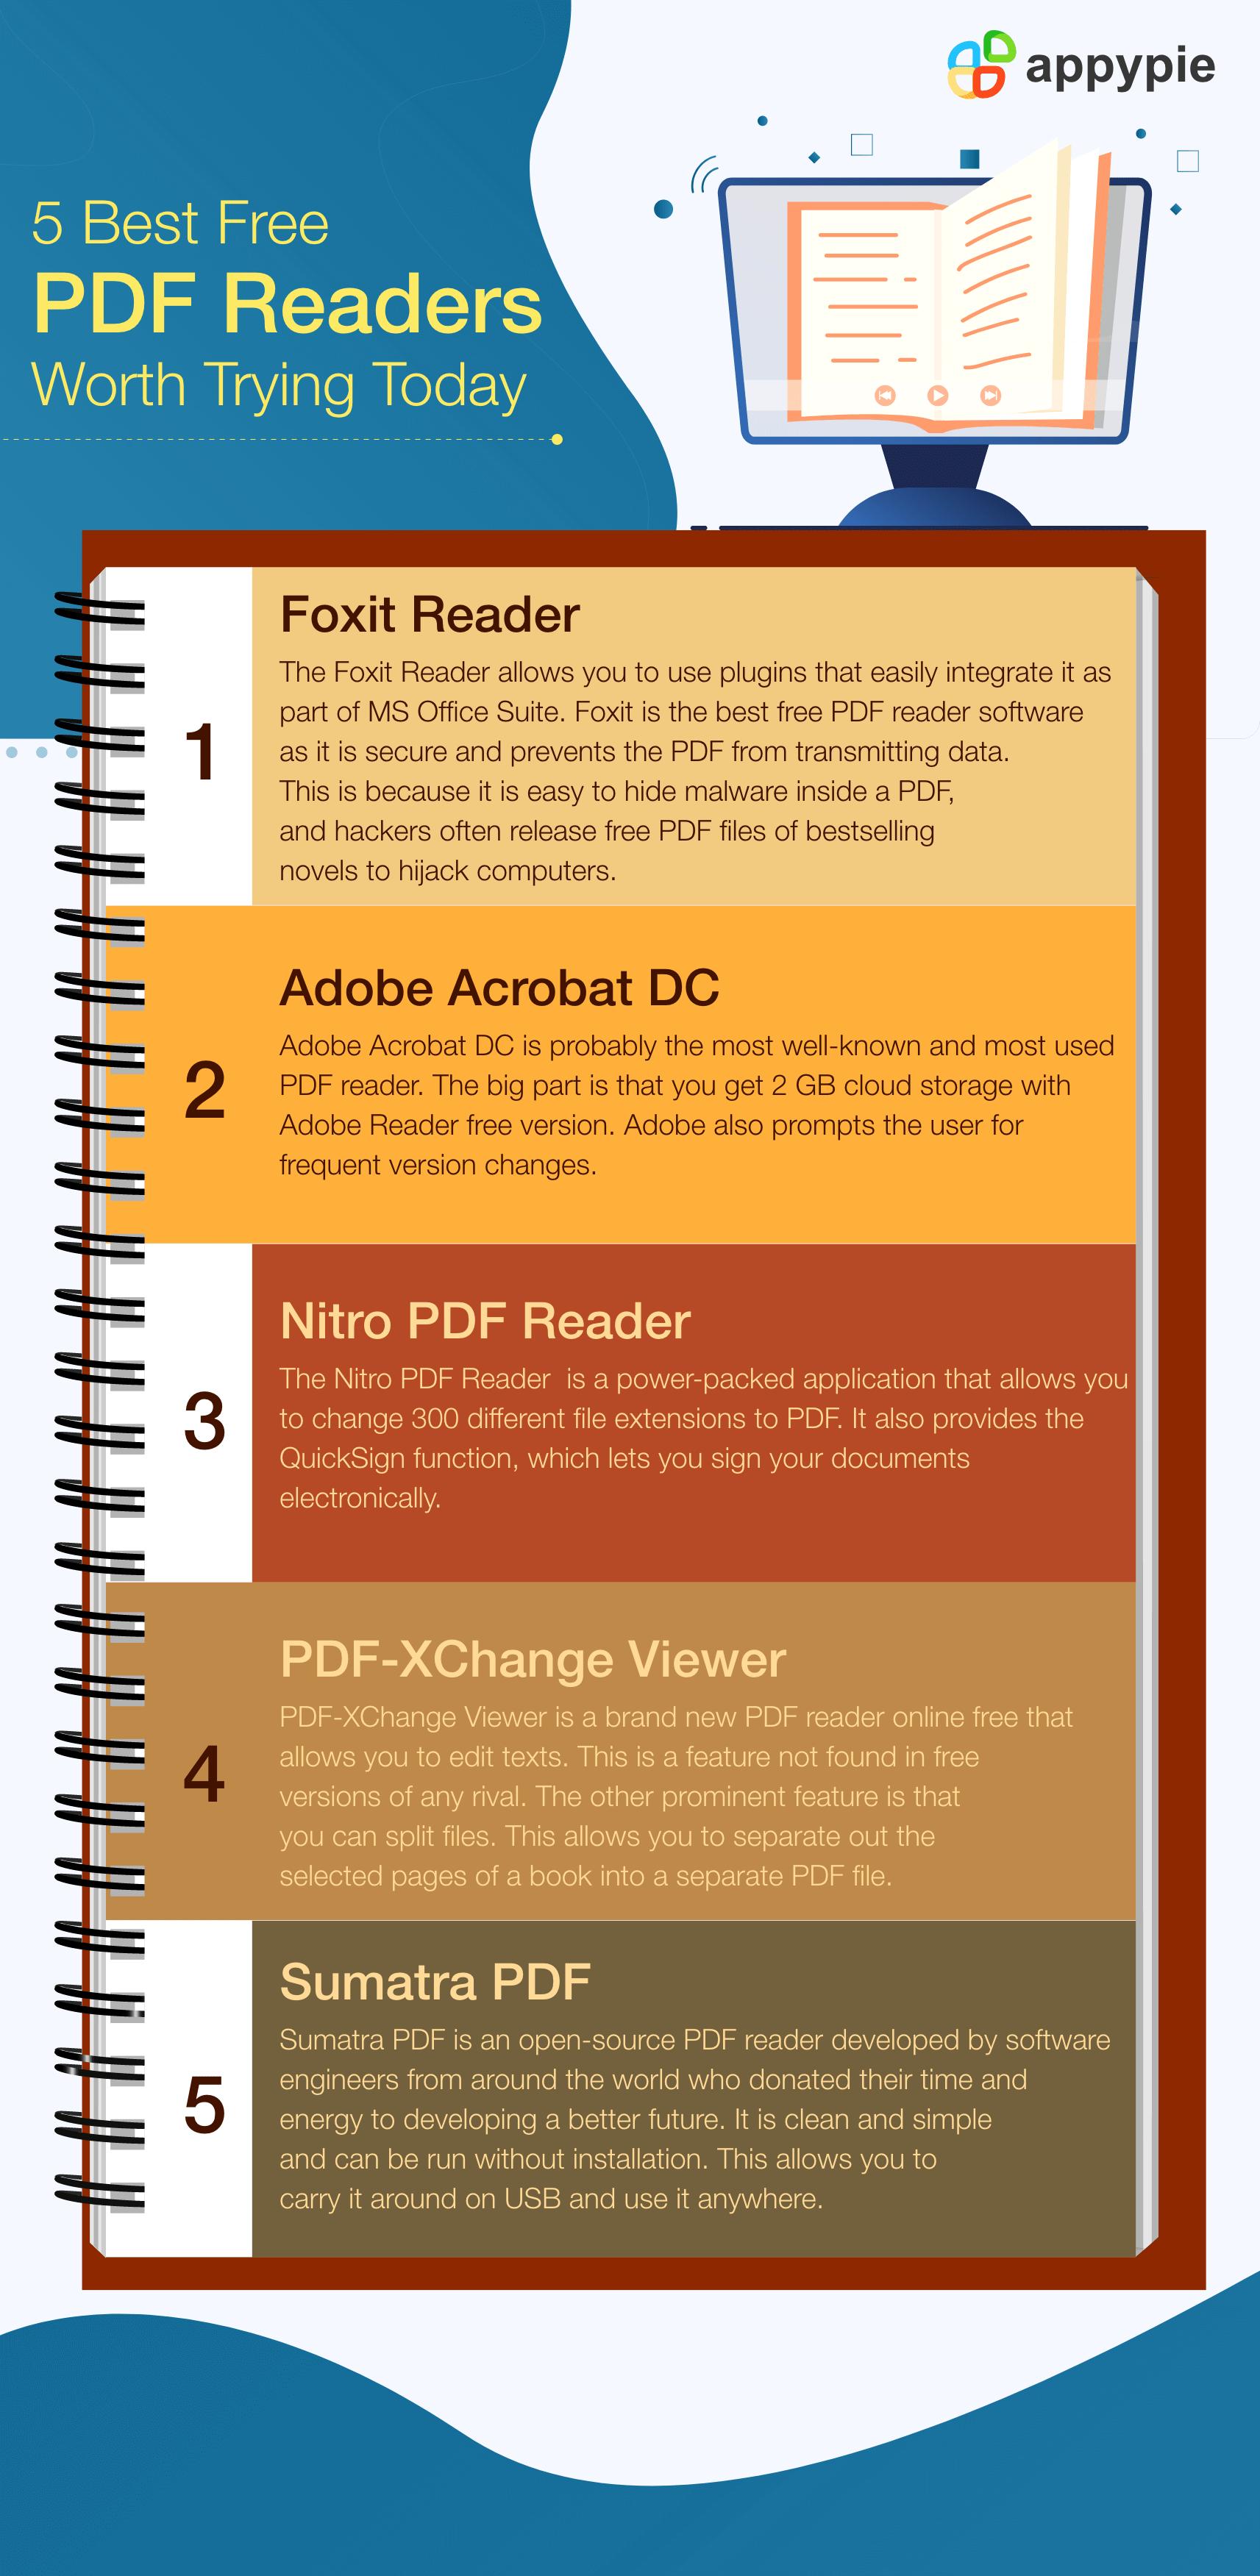 5 Best FreePDF Readers - Appy Pie